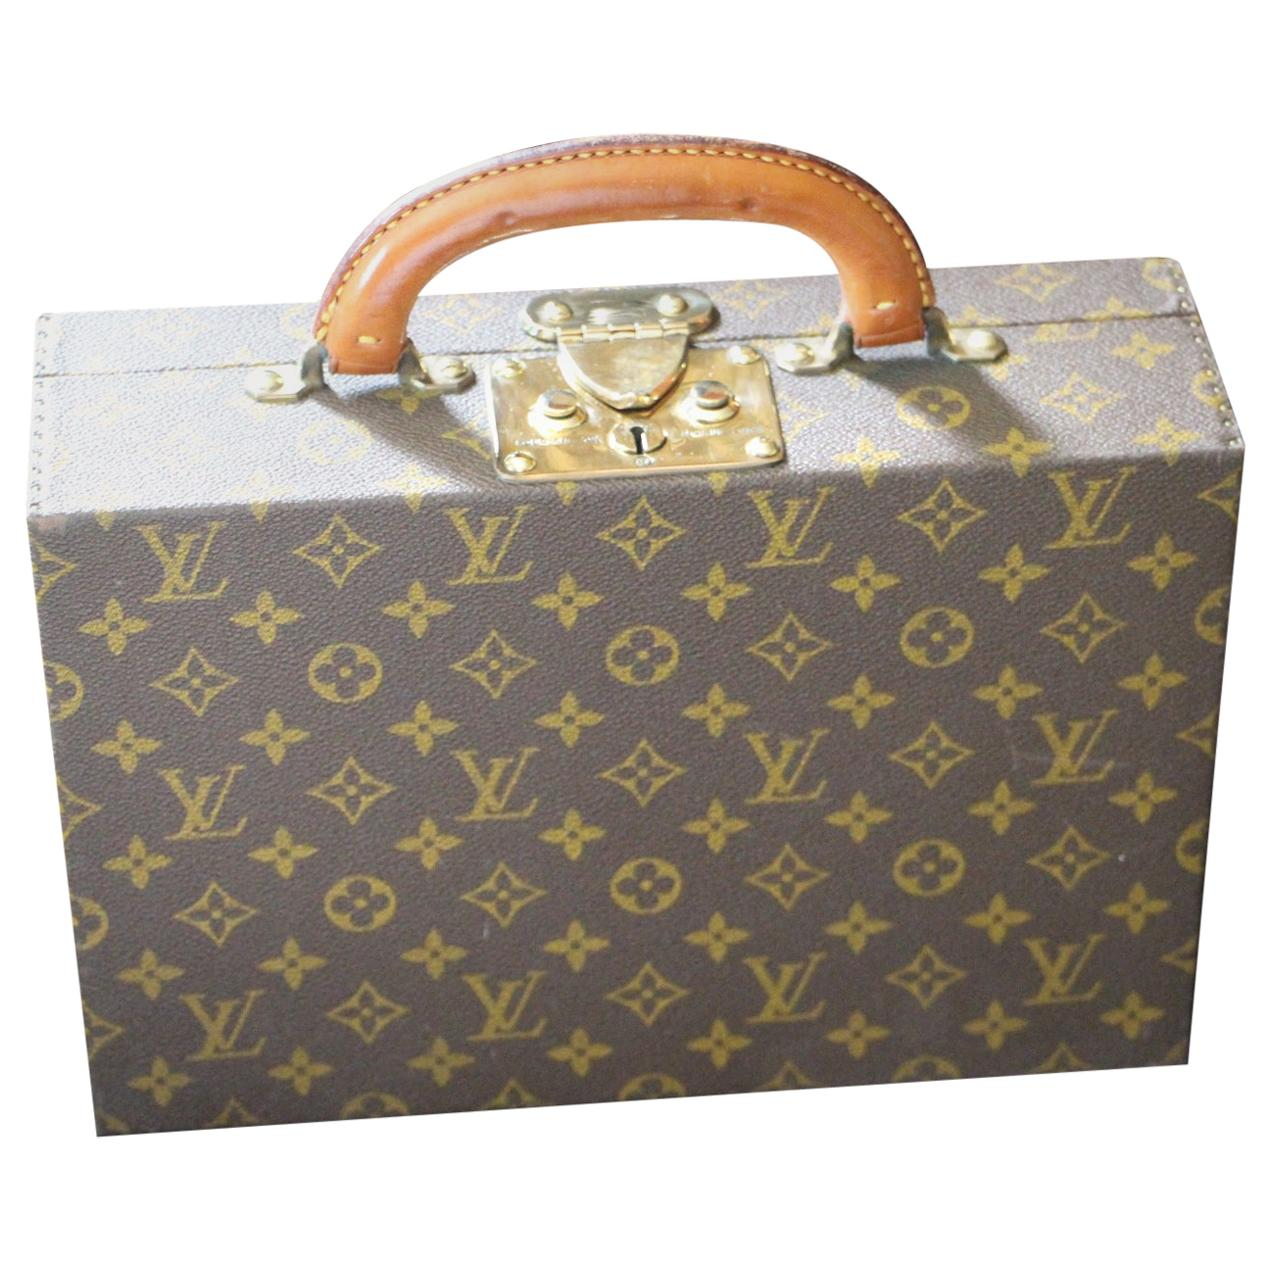 Louis Vuitton Jewelry Case Monogram Canvas, Louis Vuitton Jewelry Trunk